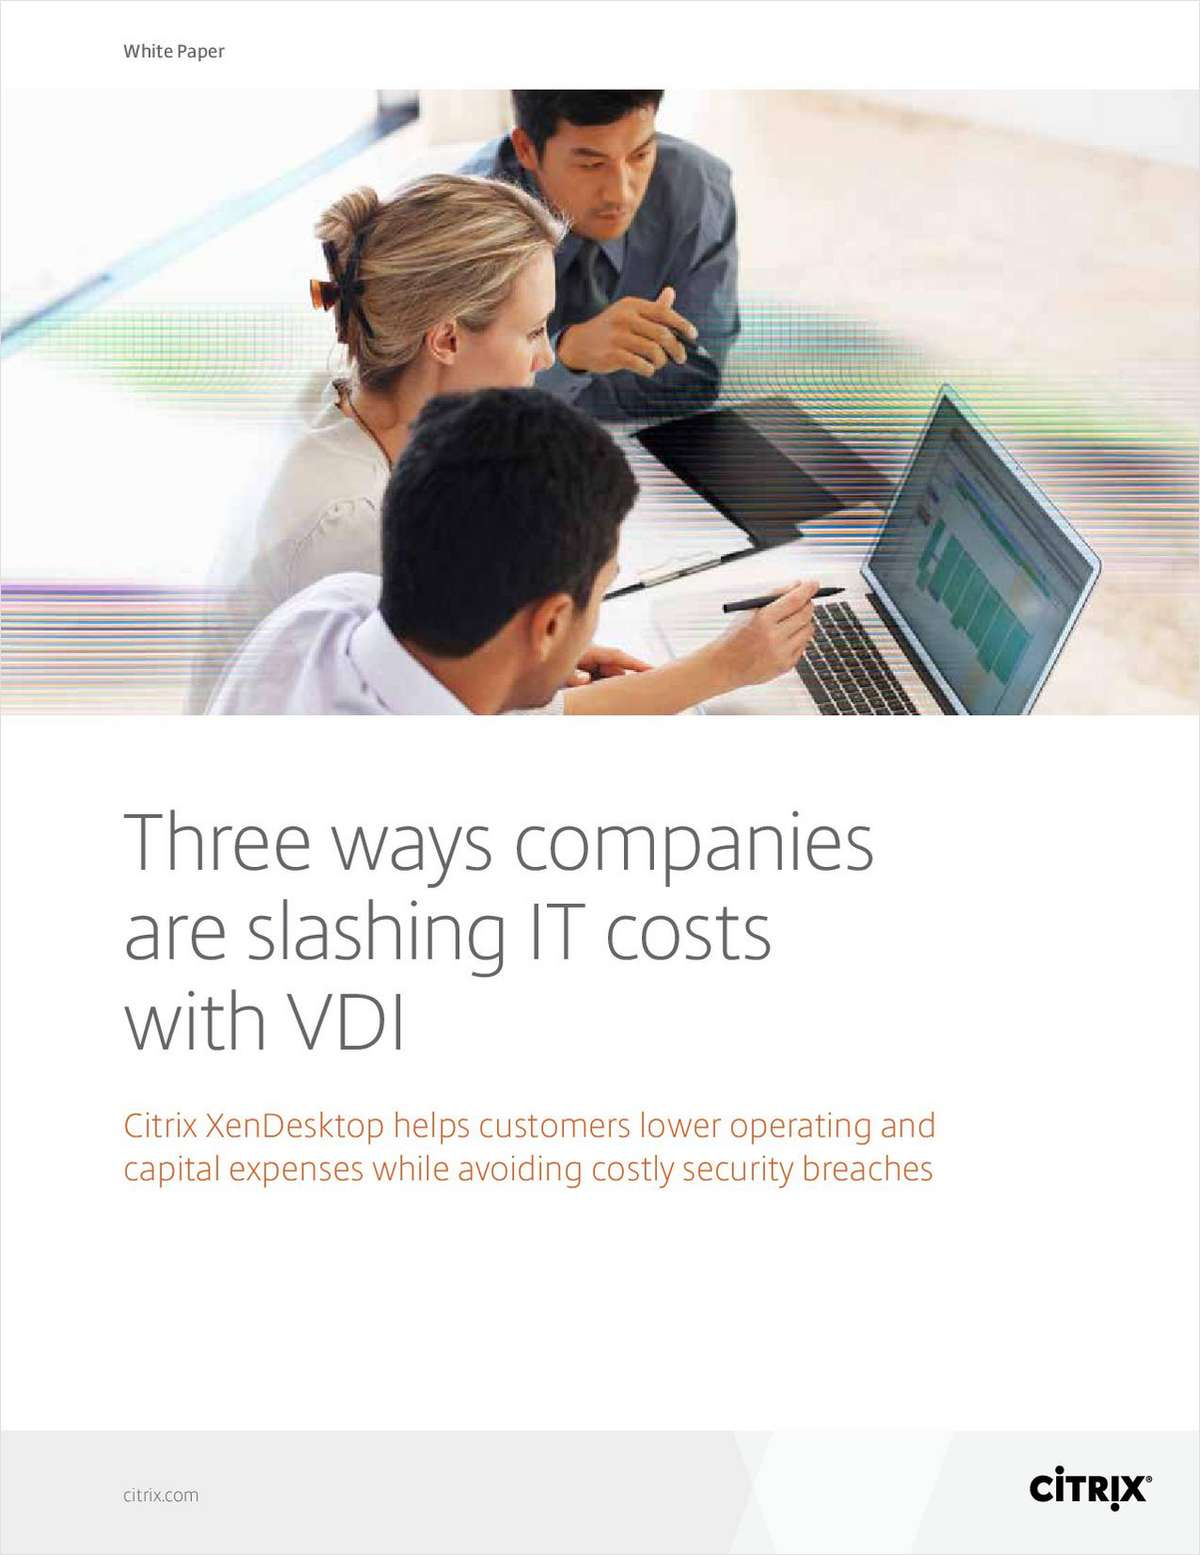 Three Ways Companies are Slashing IT Costs with VDI